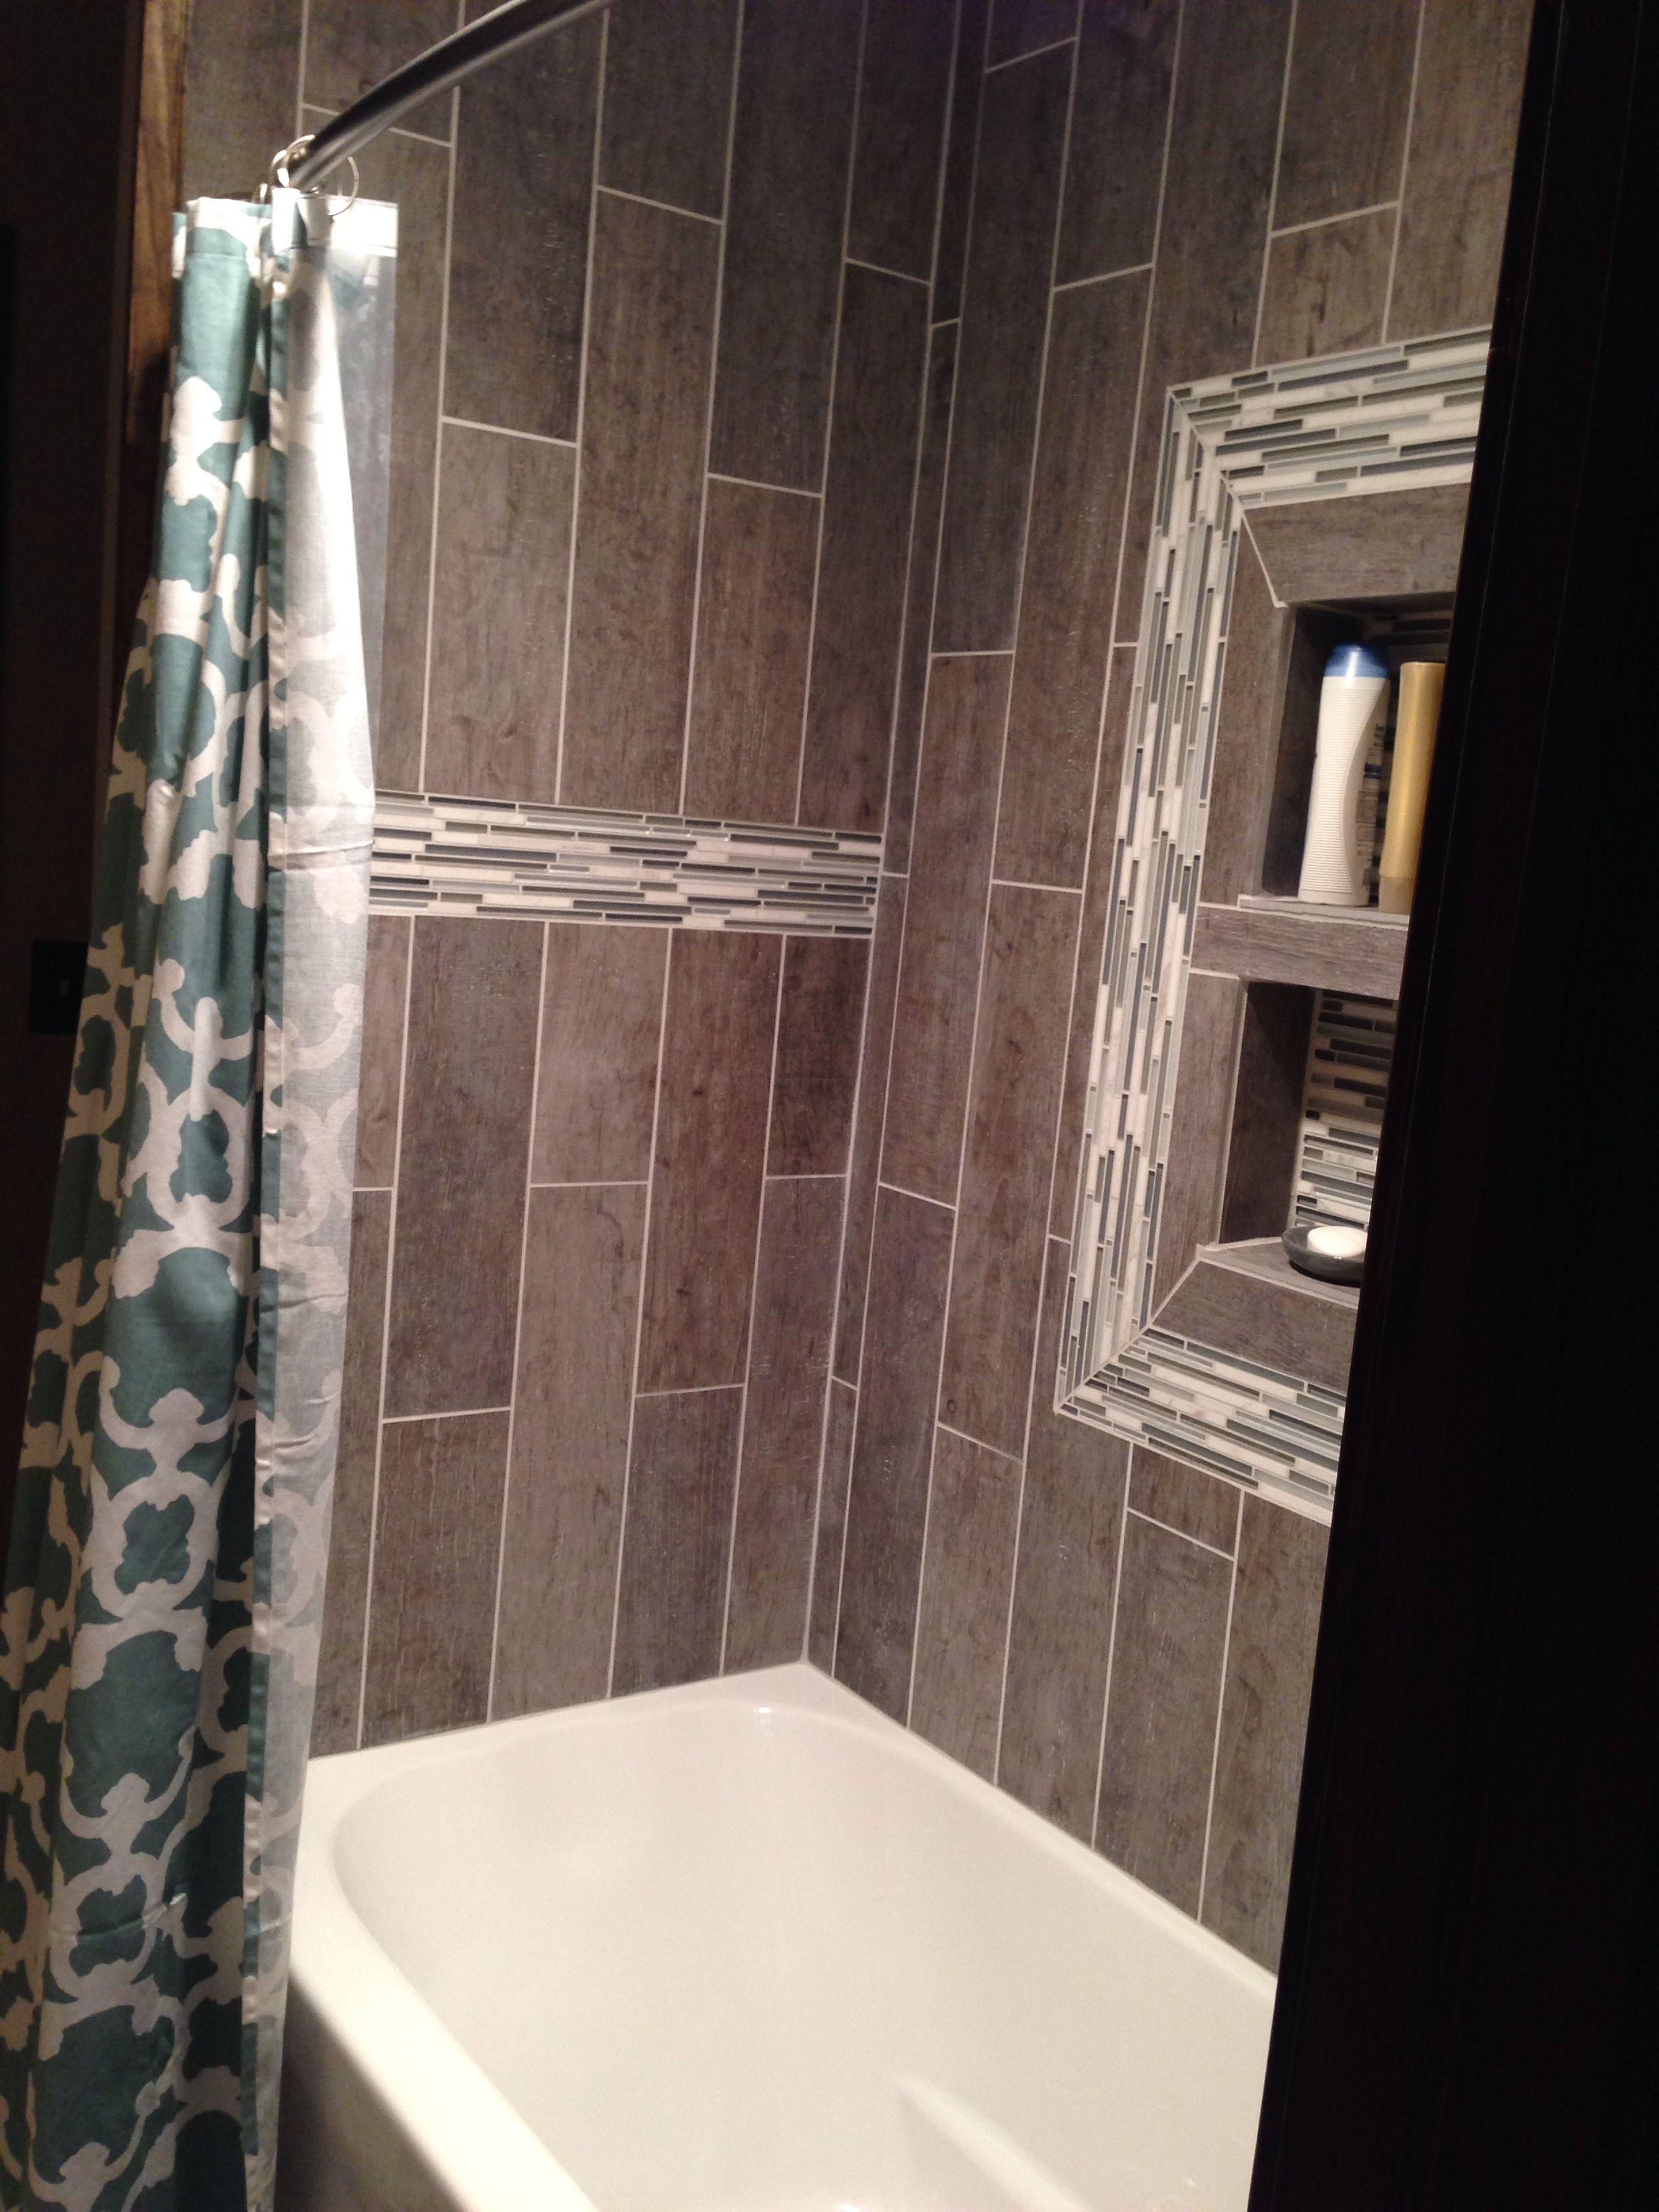 Bathroom shower tile and shower curtain Bathroom shower